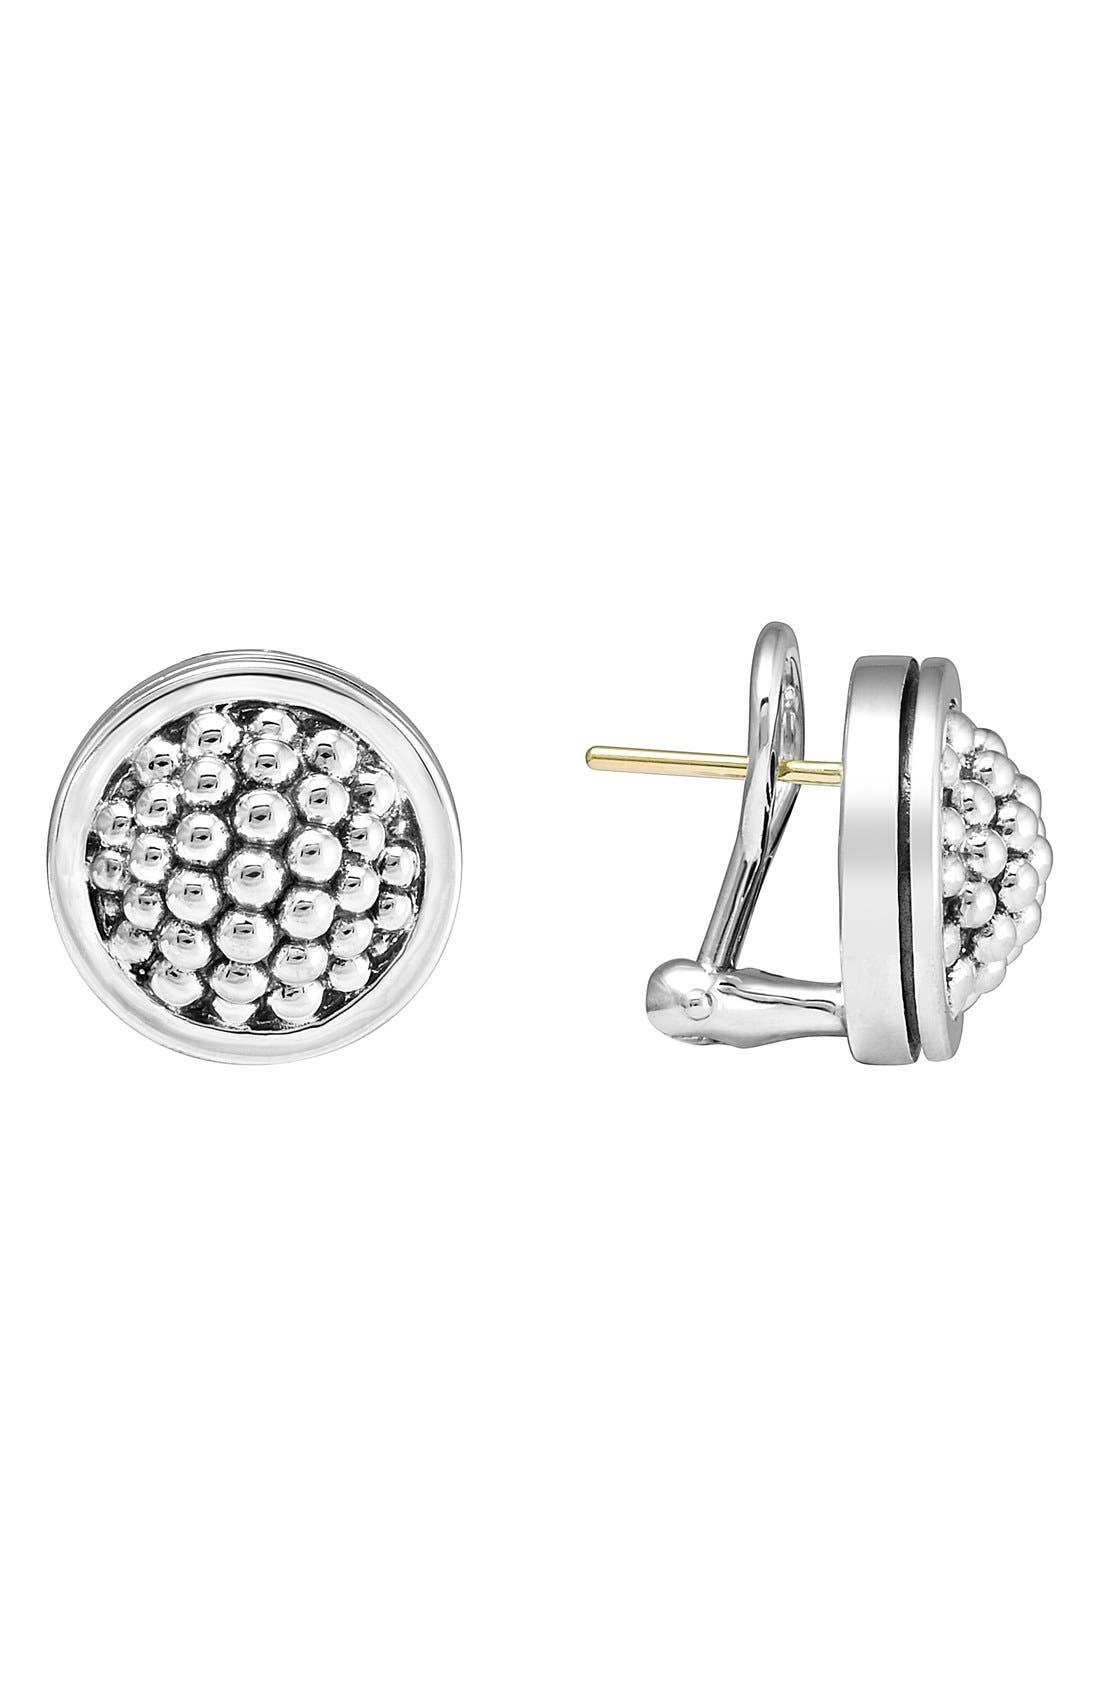 LAGOS Caviar Stud Earrings